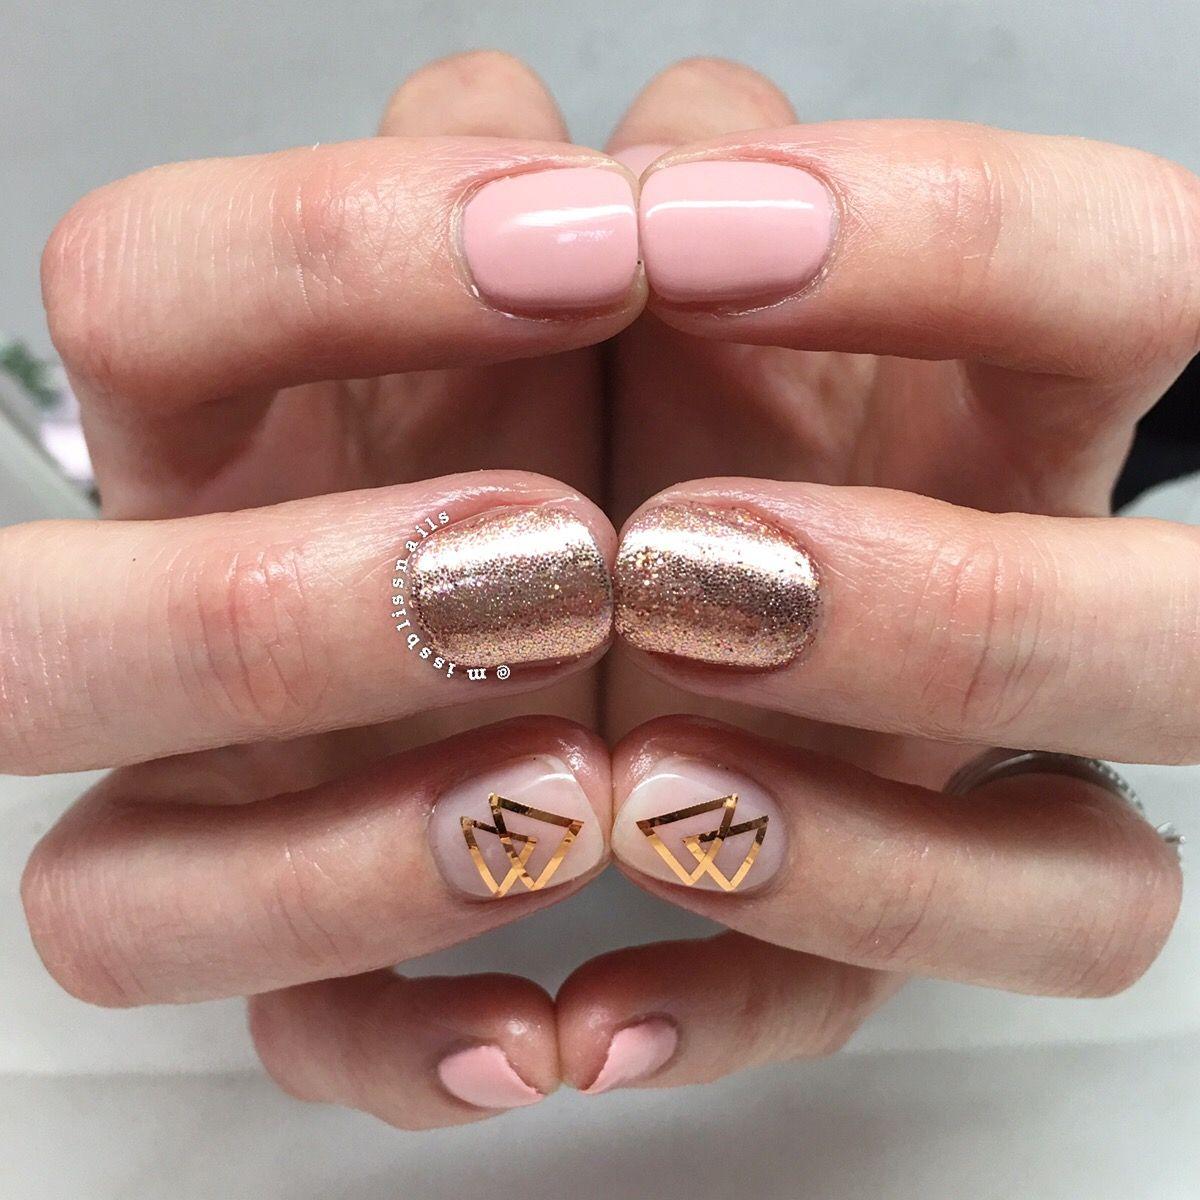 missblissnails #nails #naildesign #nailart #artisticcolourgloss ...